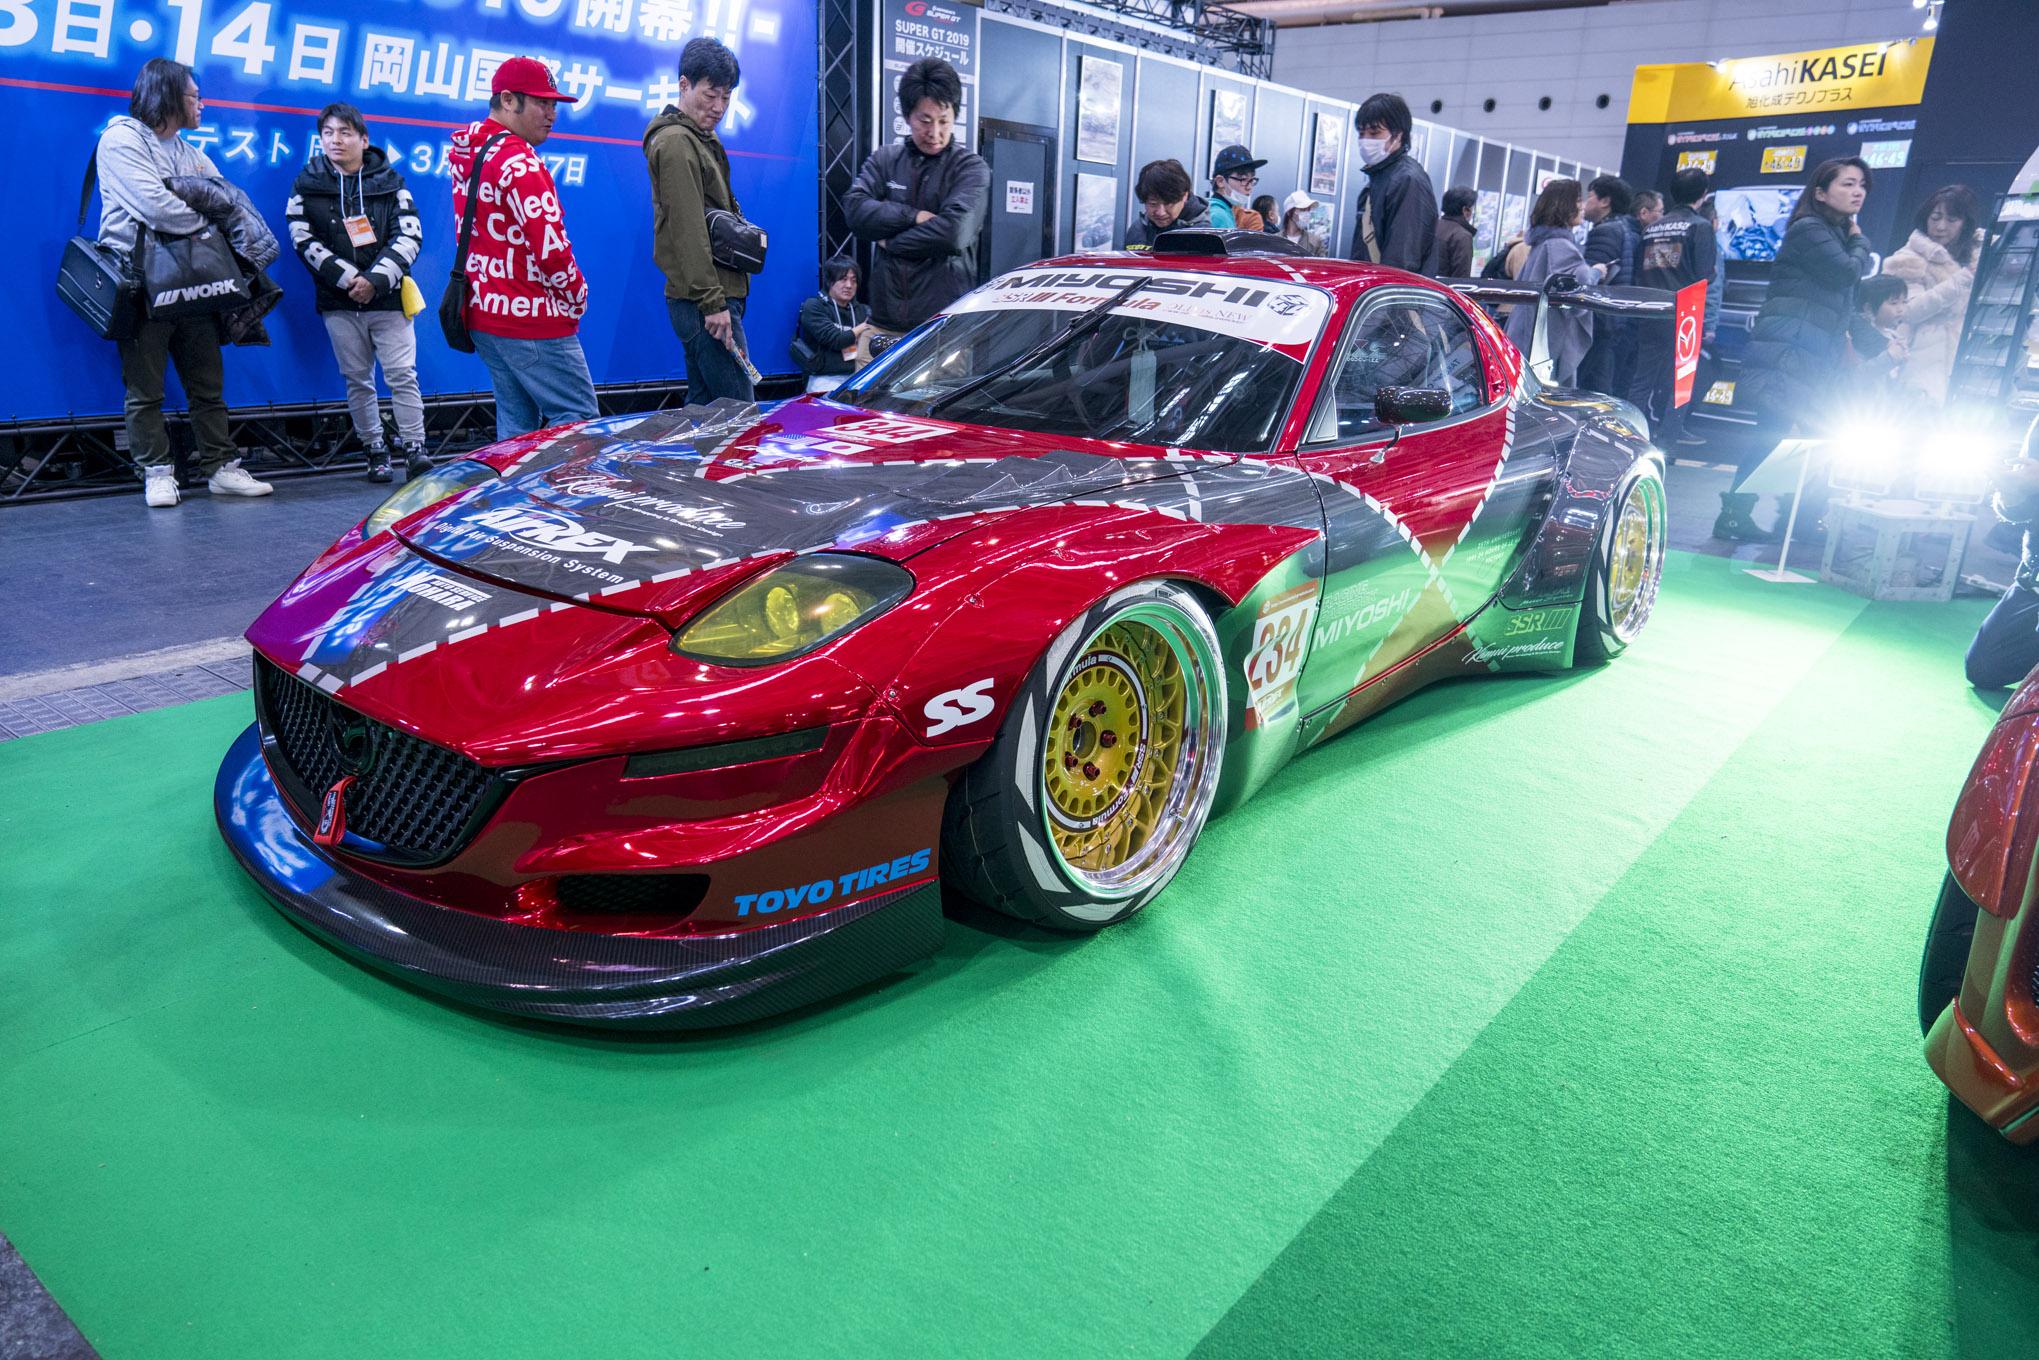 Osaka Auto Messe 2019 Pt. II